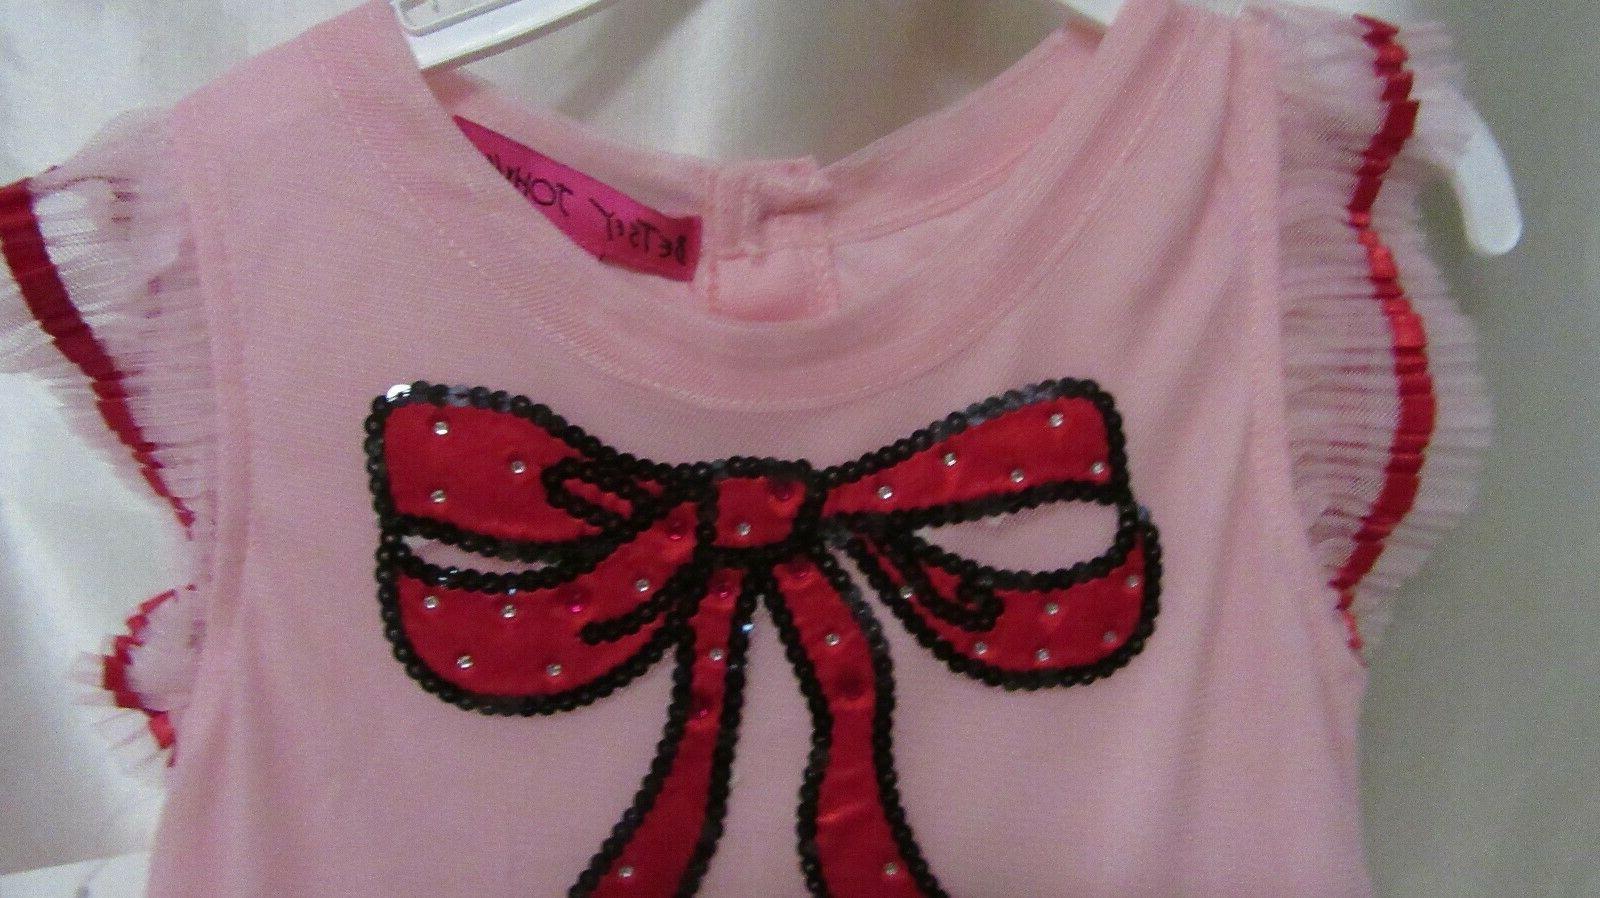 LITTLE JOHNSON PARTY DRESS SIZE 3T NEW /W T PINK W RUFFLES